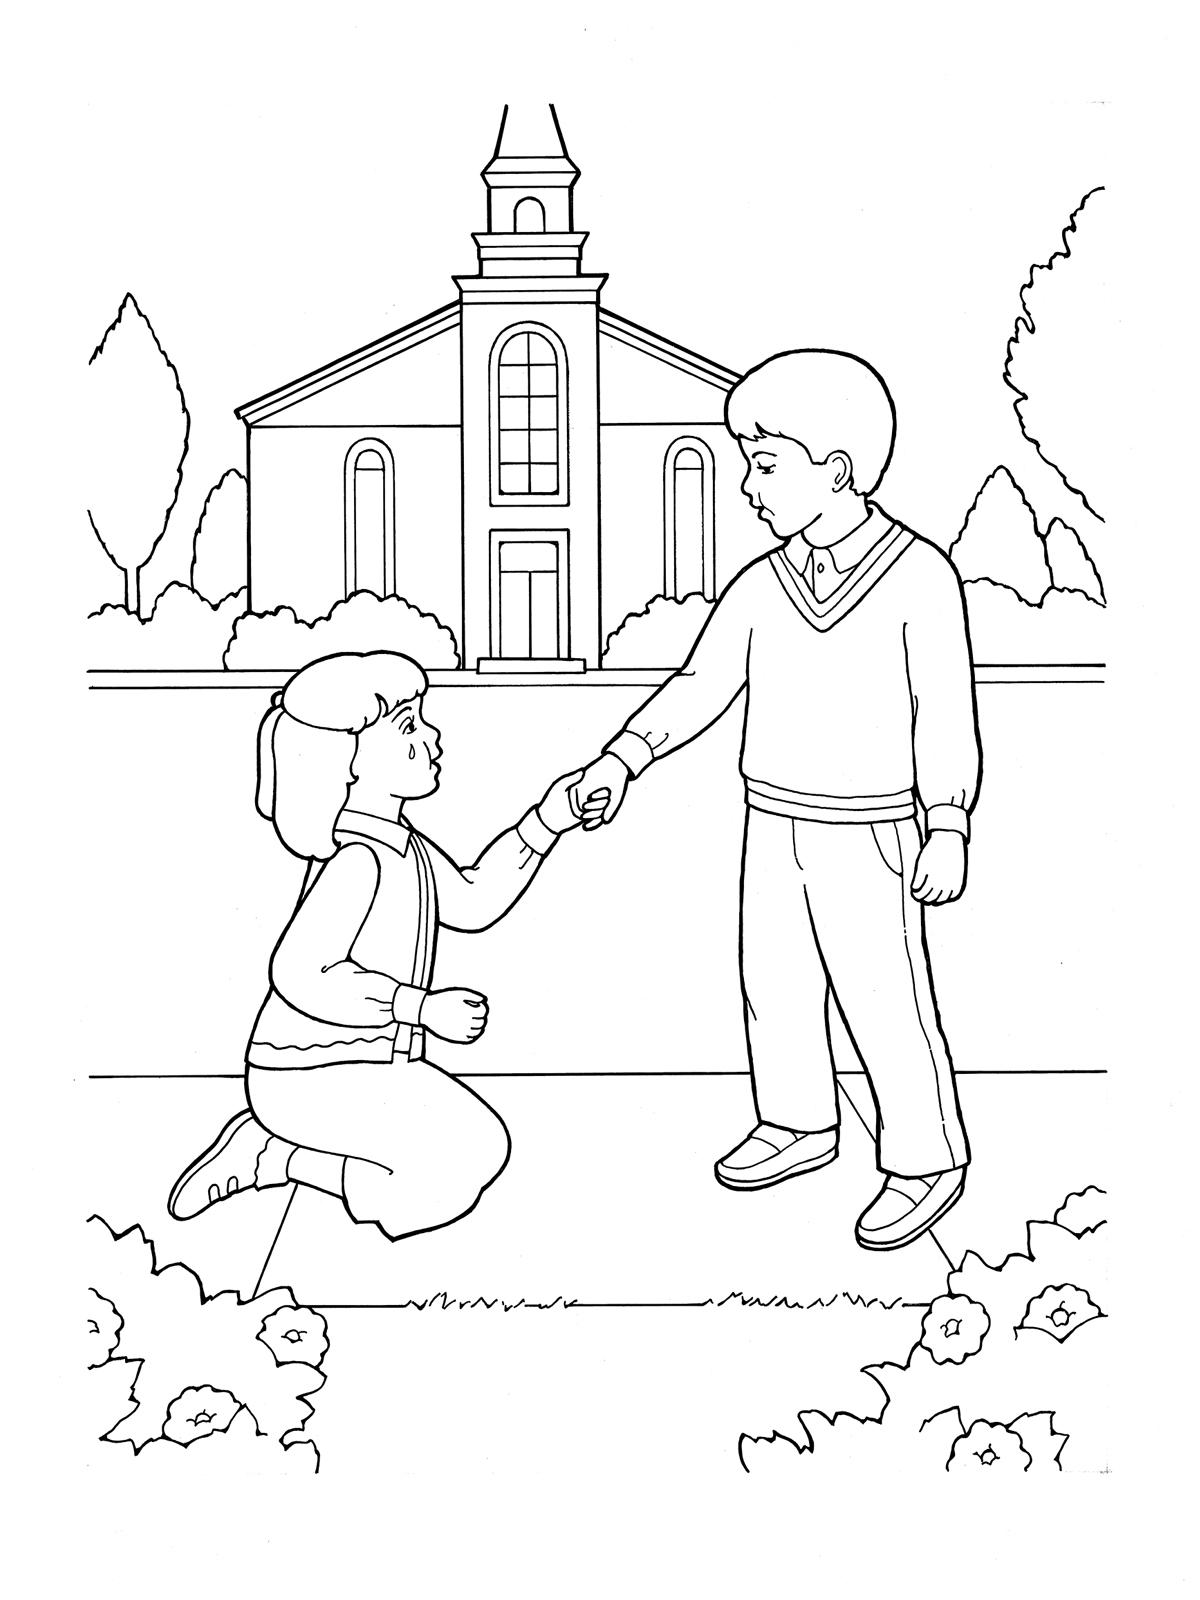 Boy Helping Crying Girl